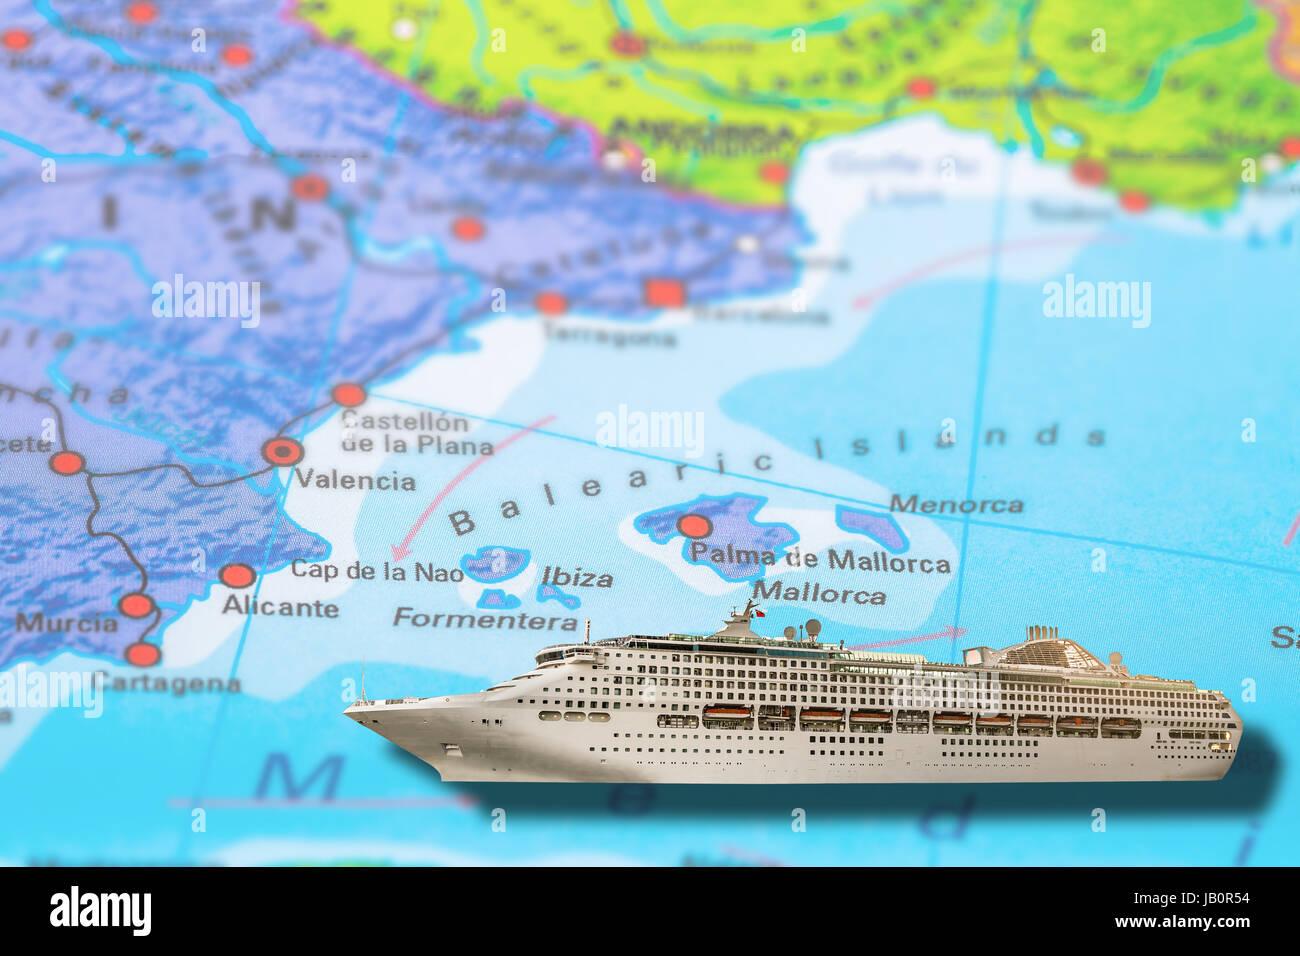 Ibiza Formentera Valencia in Spain cruise ship travel on colorful